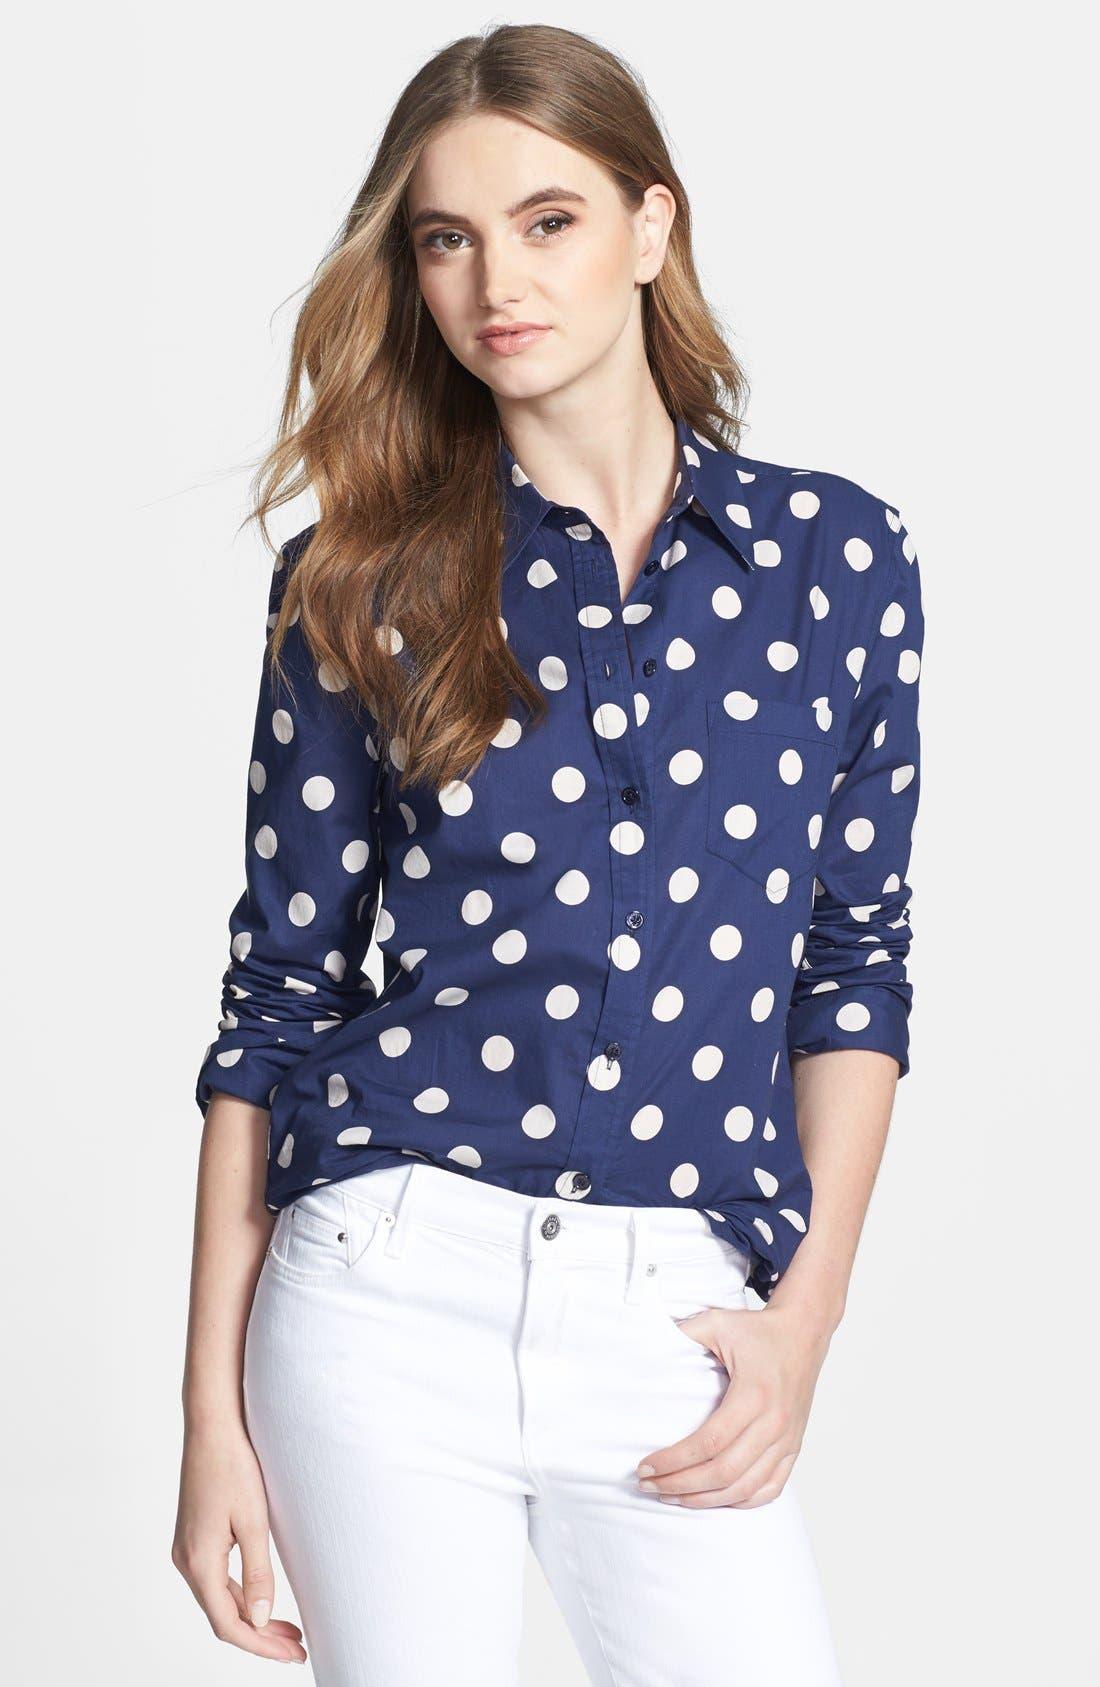 Alternate Image 1 Selected - Equipment 'Reese' Polka Dot Cotton Shirt